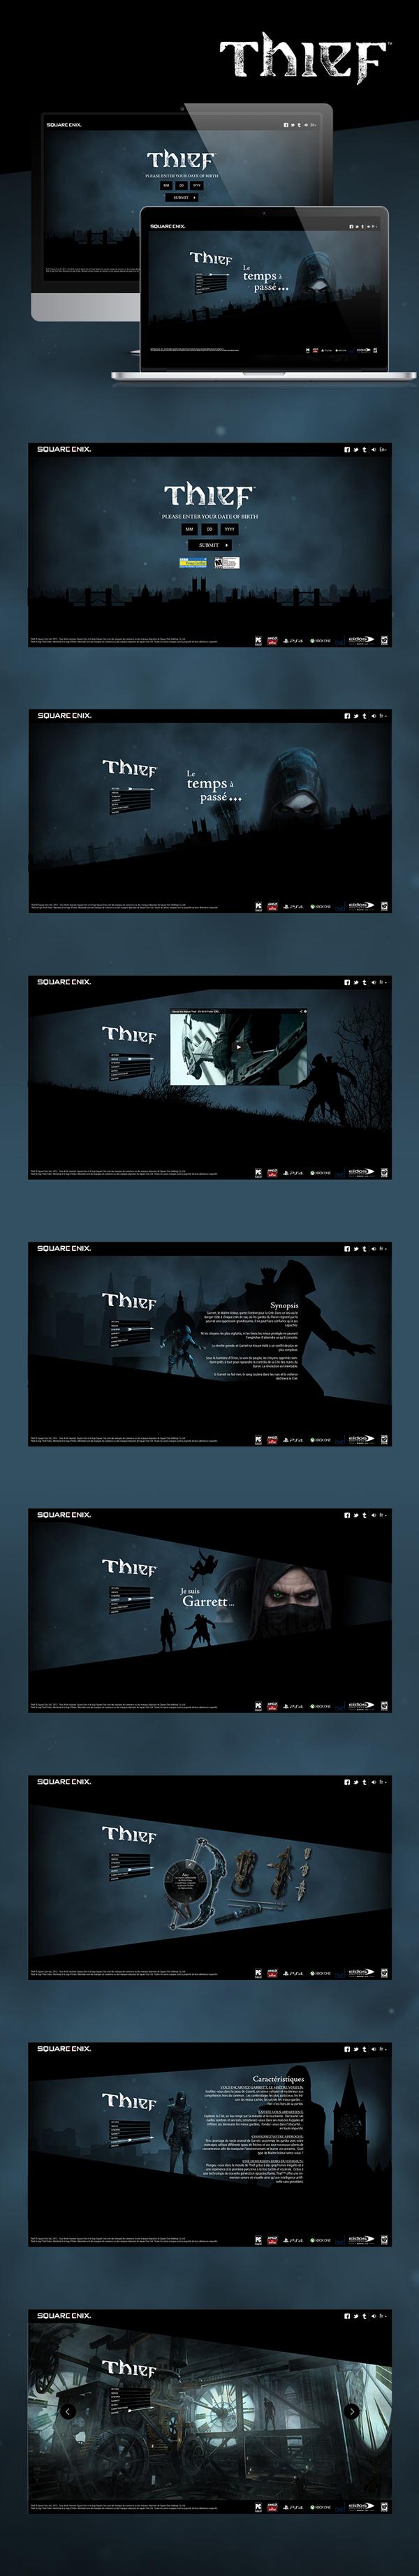 Thief on Behance